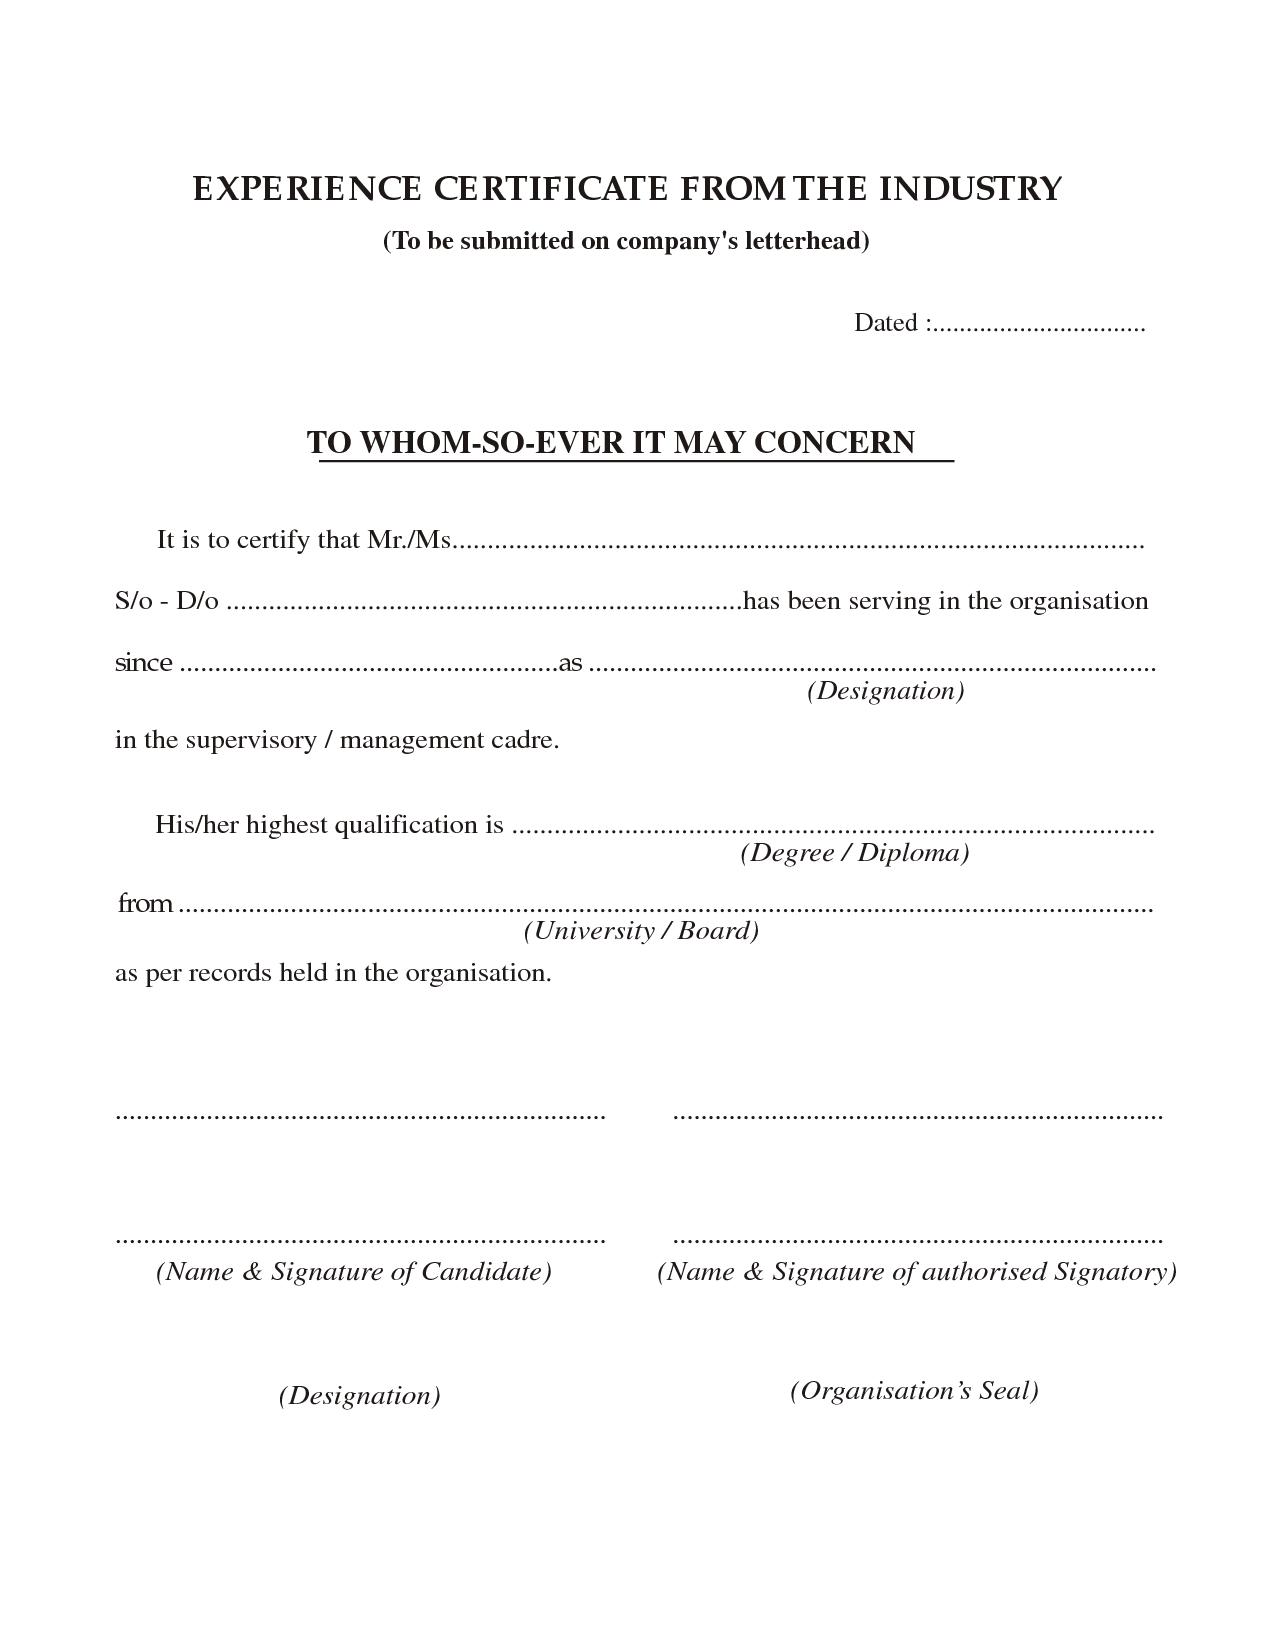 Experience Certificate Template internship sample work – Work Done Certificate Sample